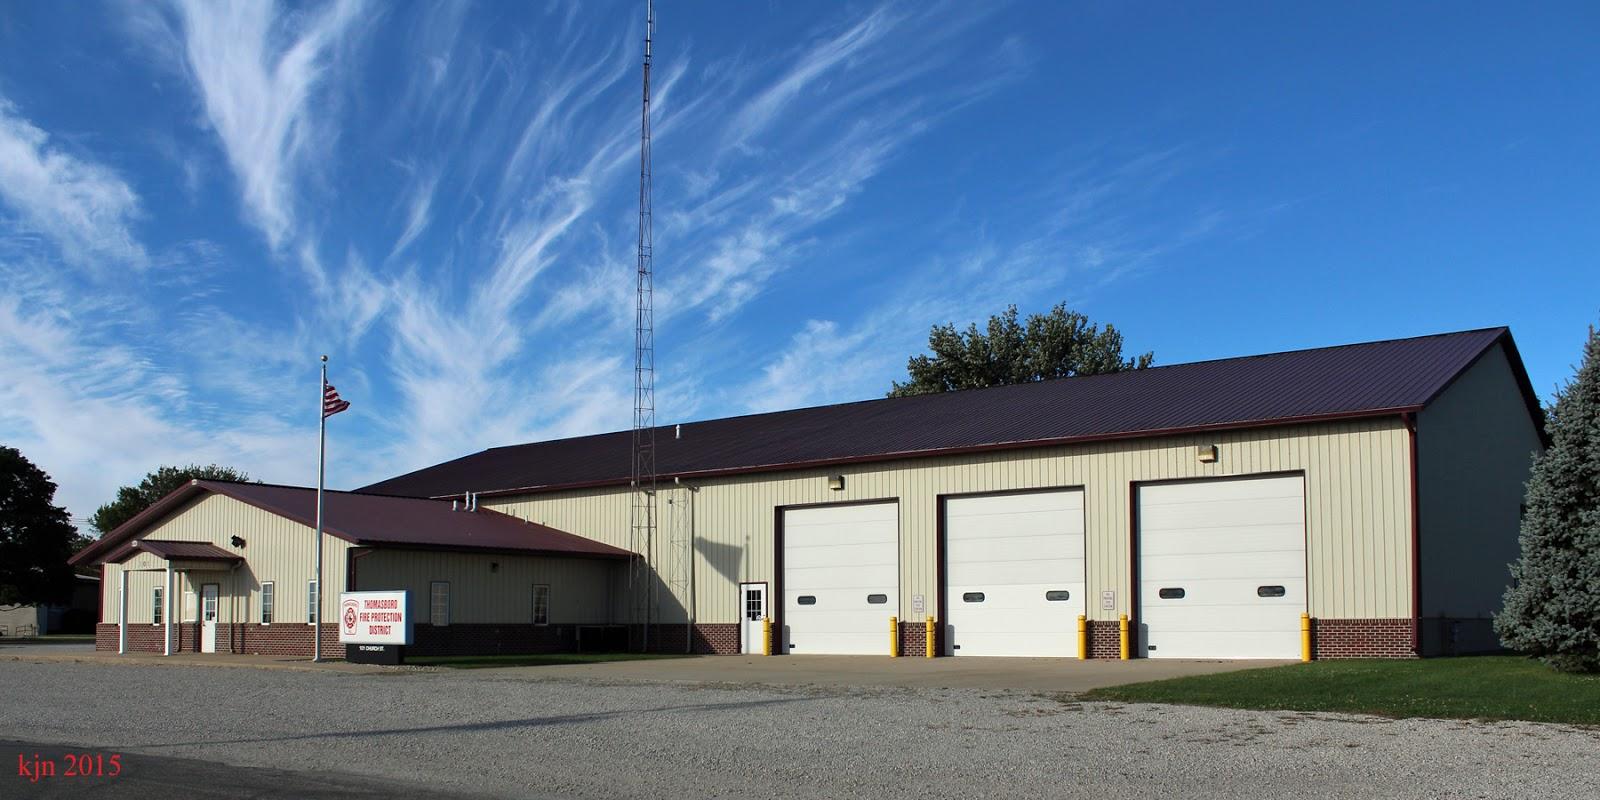 Illinois champaign county thomasboro - Thomasboro Fire Protection District